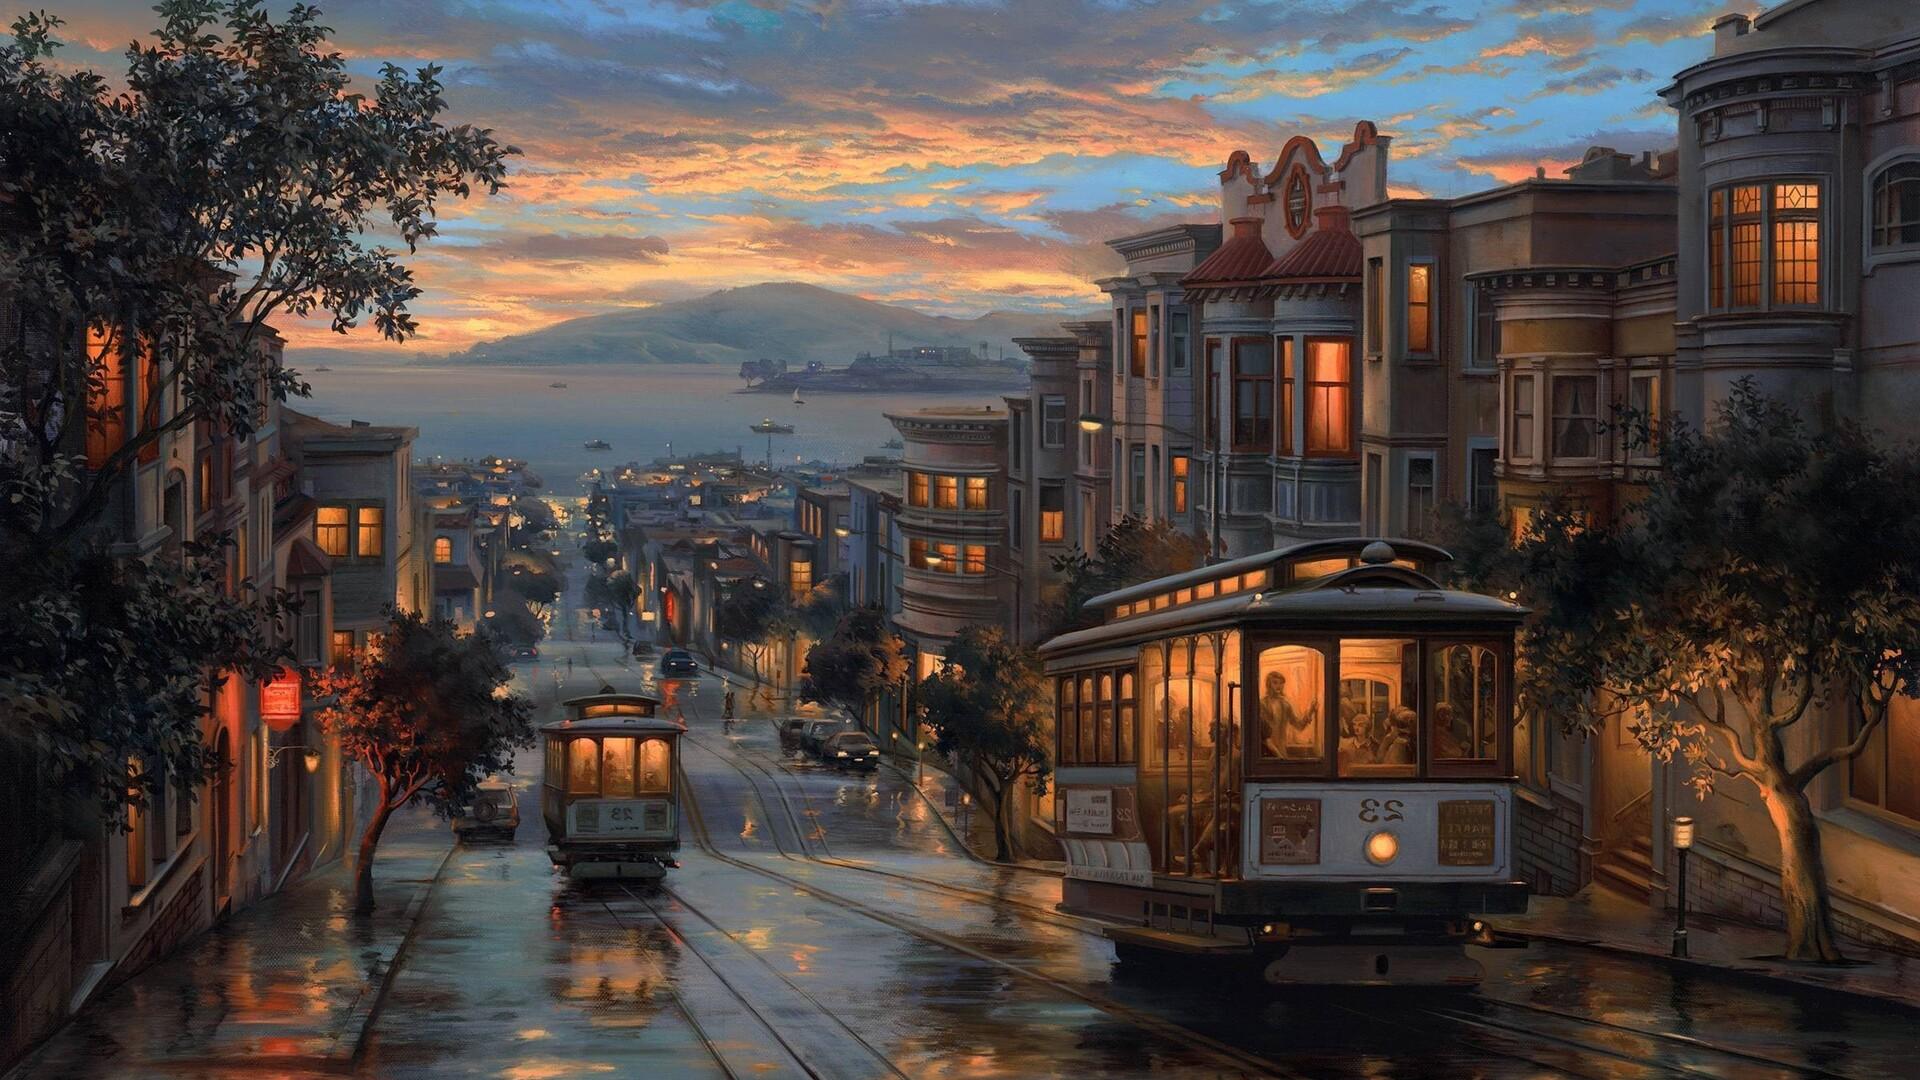 rainy,night,artistic,painting